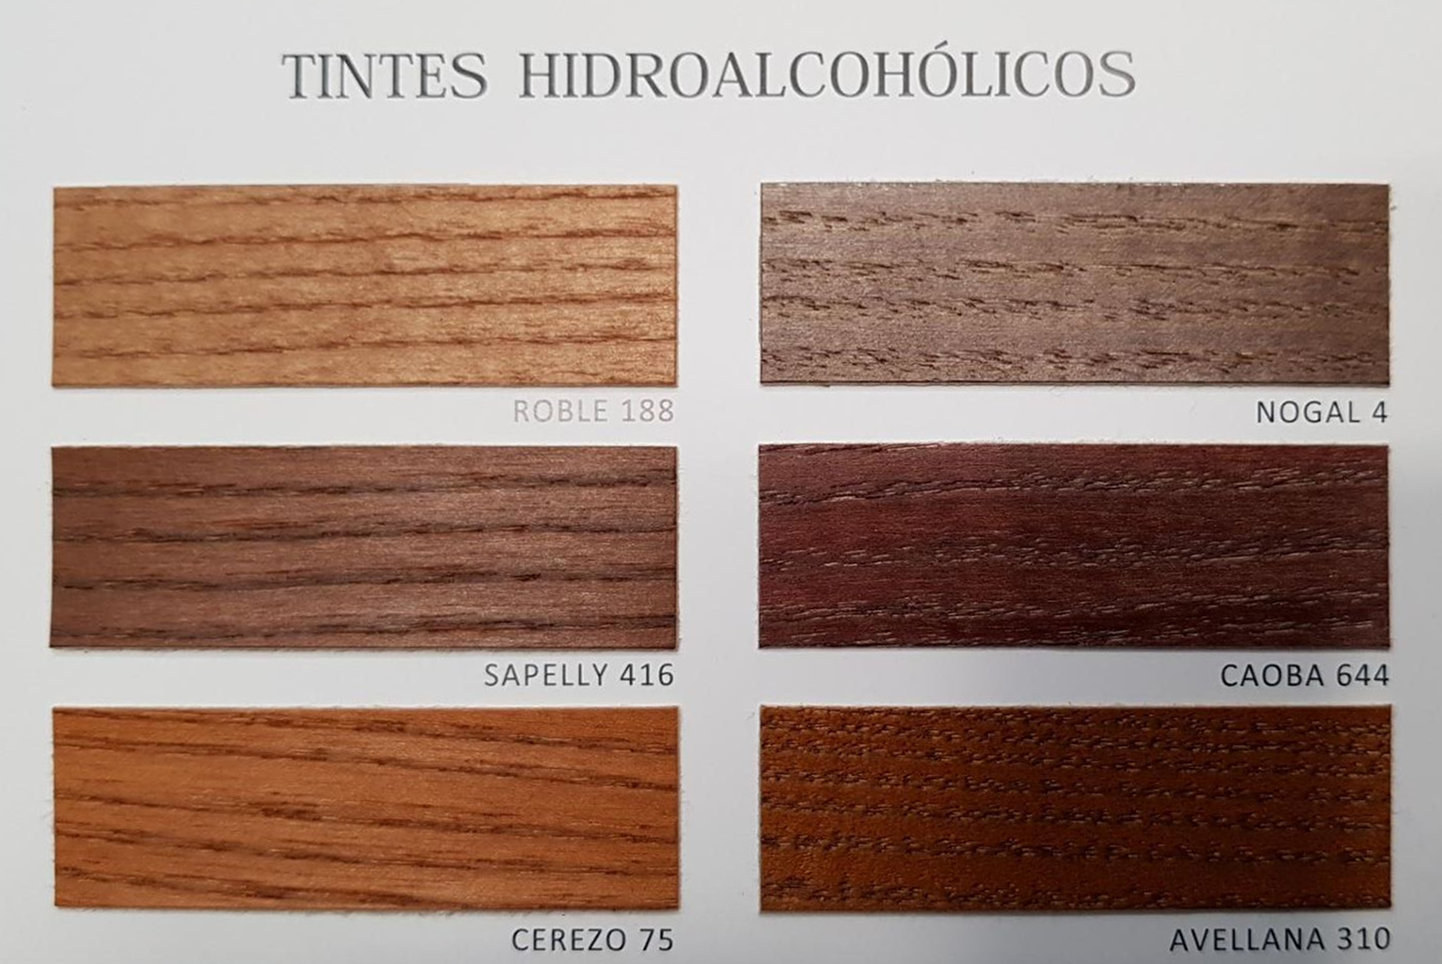 Tintes Hidroalcoholicos Sambara ~ Reparar Arañazos Madera Barnizada